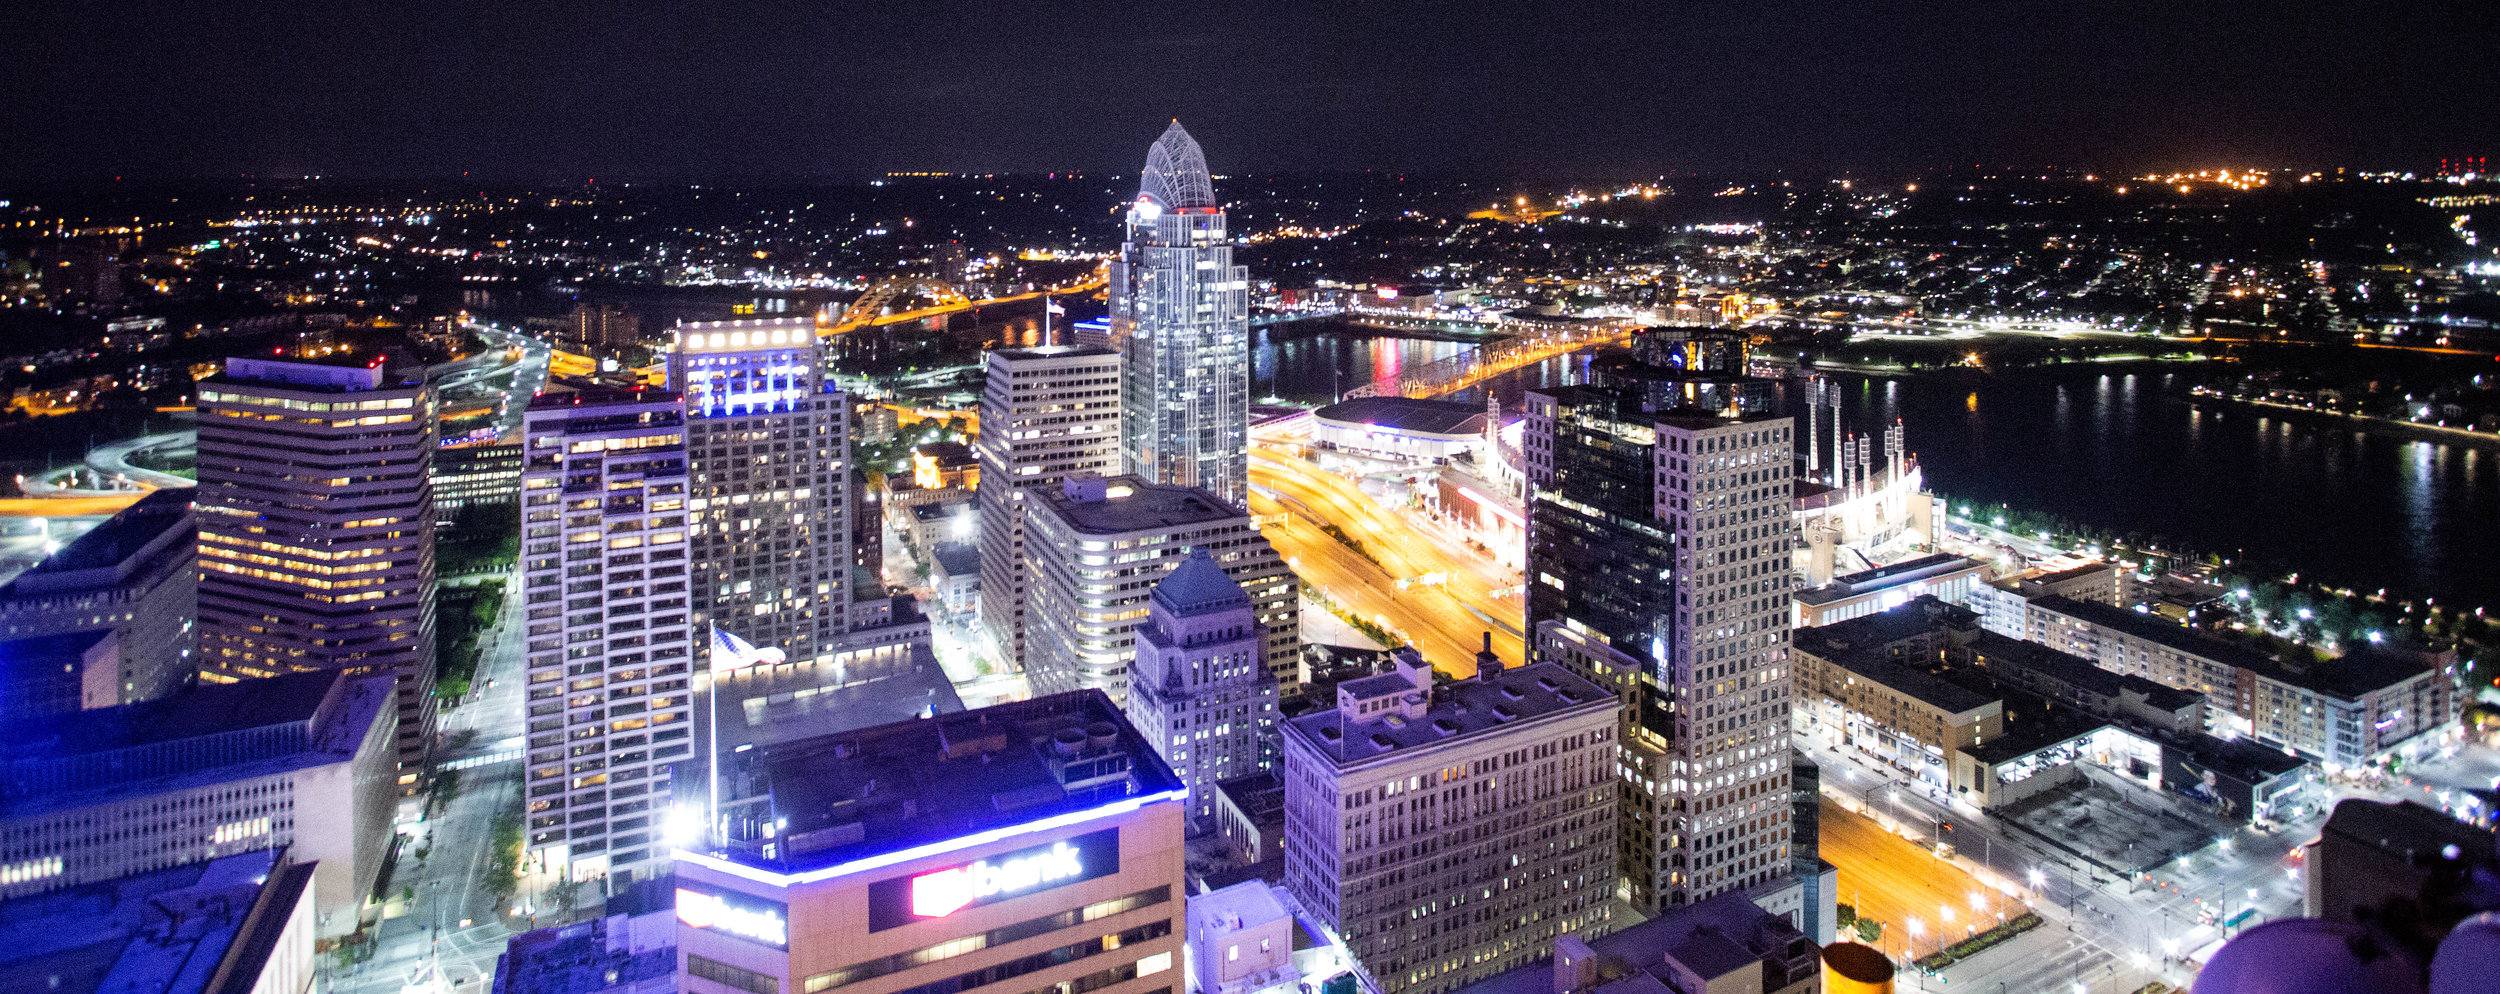 city (1 of 1).jpg